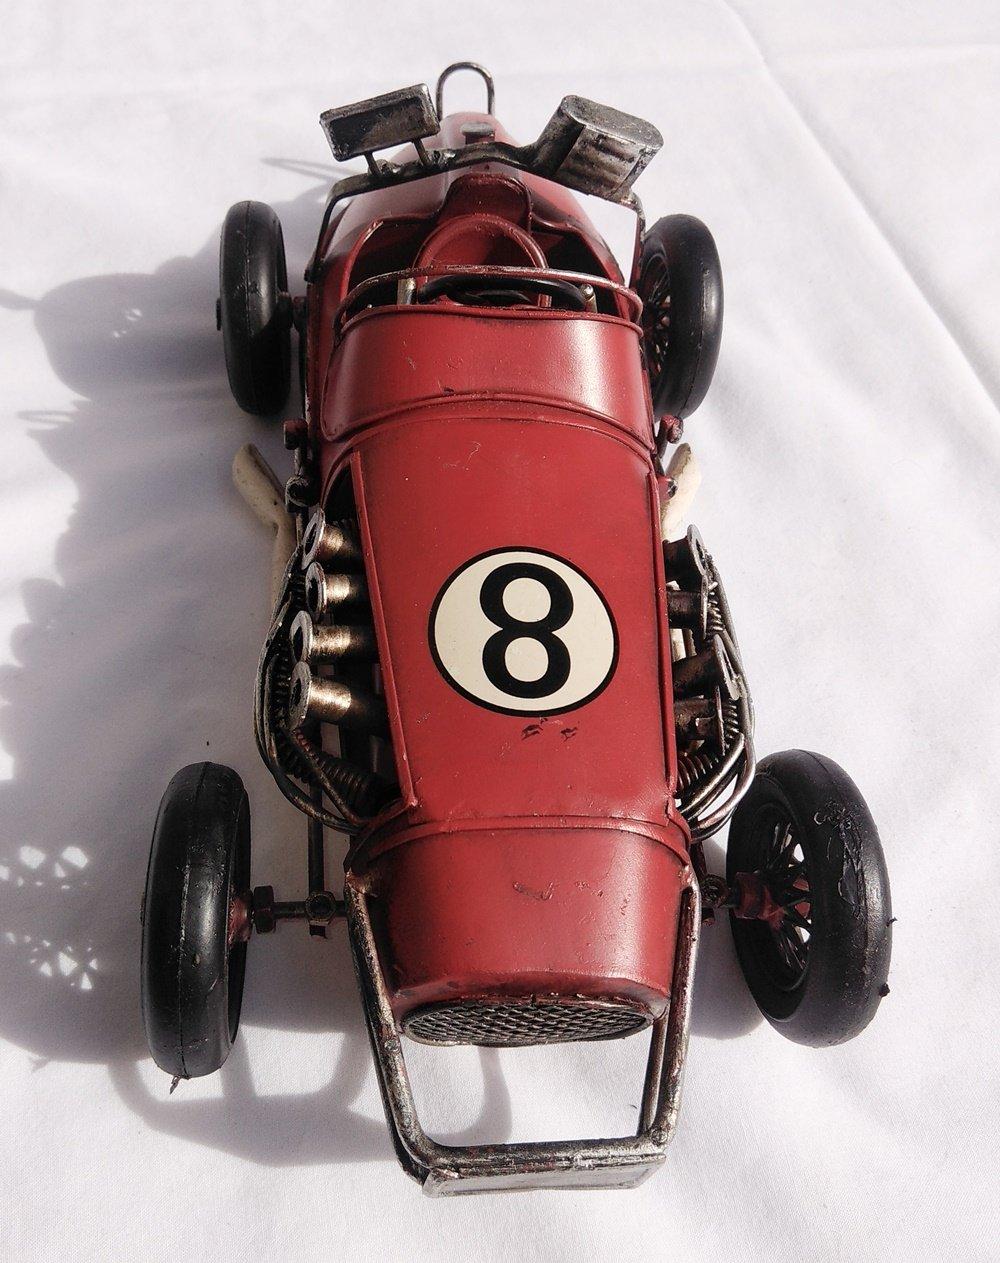 Fandg forniture lovely Large (31CM) vintage retrò metallo Brooklands Racer metal Racing Car ornaments- disponibile in due colori–grande idea regalo per qualsiasi mensola o scrivania. Green SIL